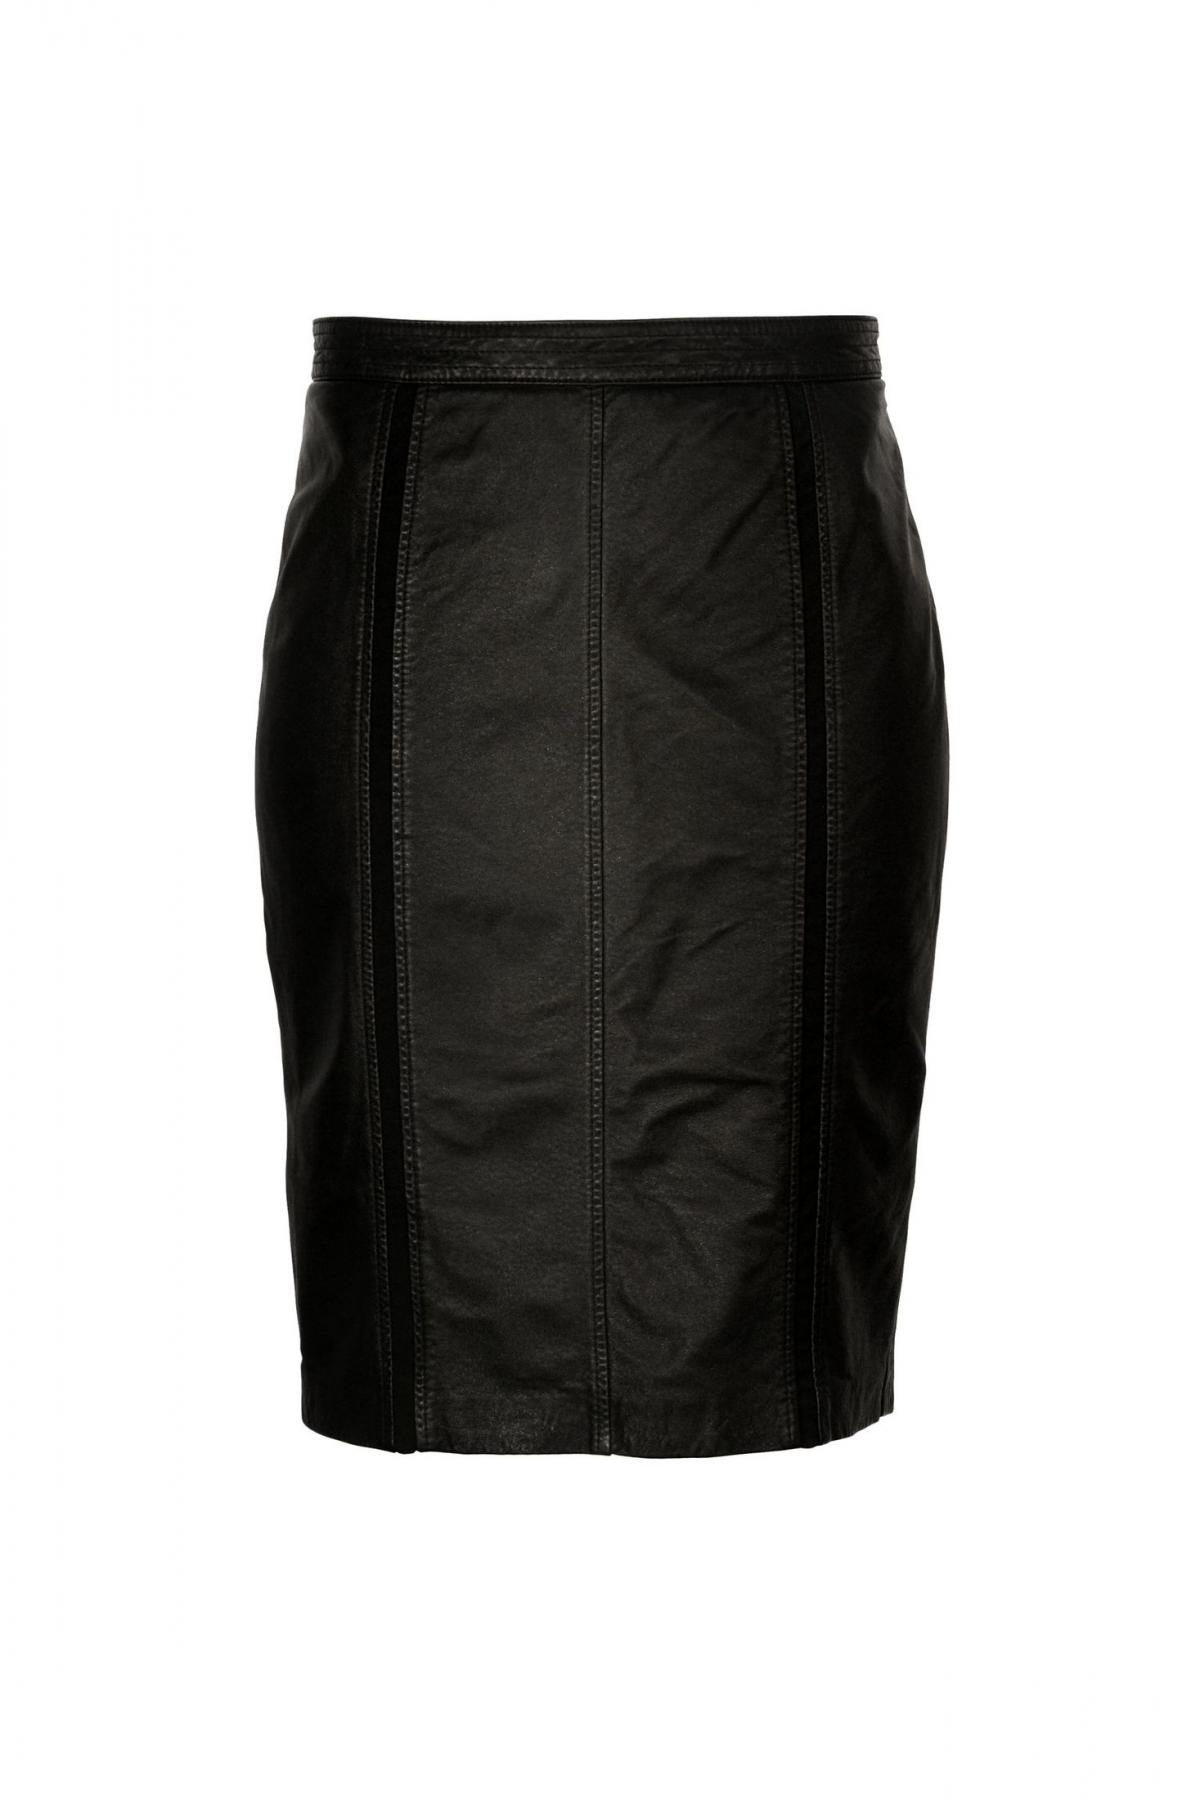 czarna spódnica Ochnik  - kolekcja wiosenno-letnia